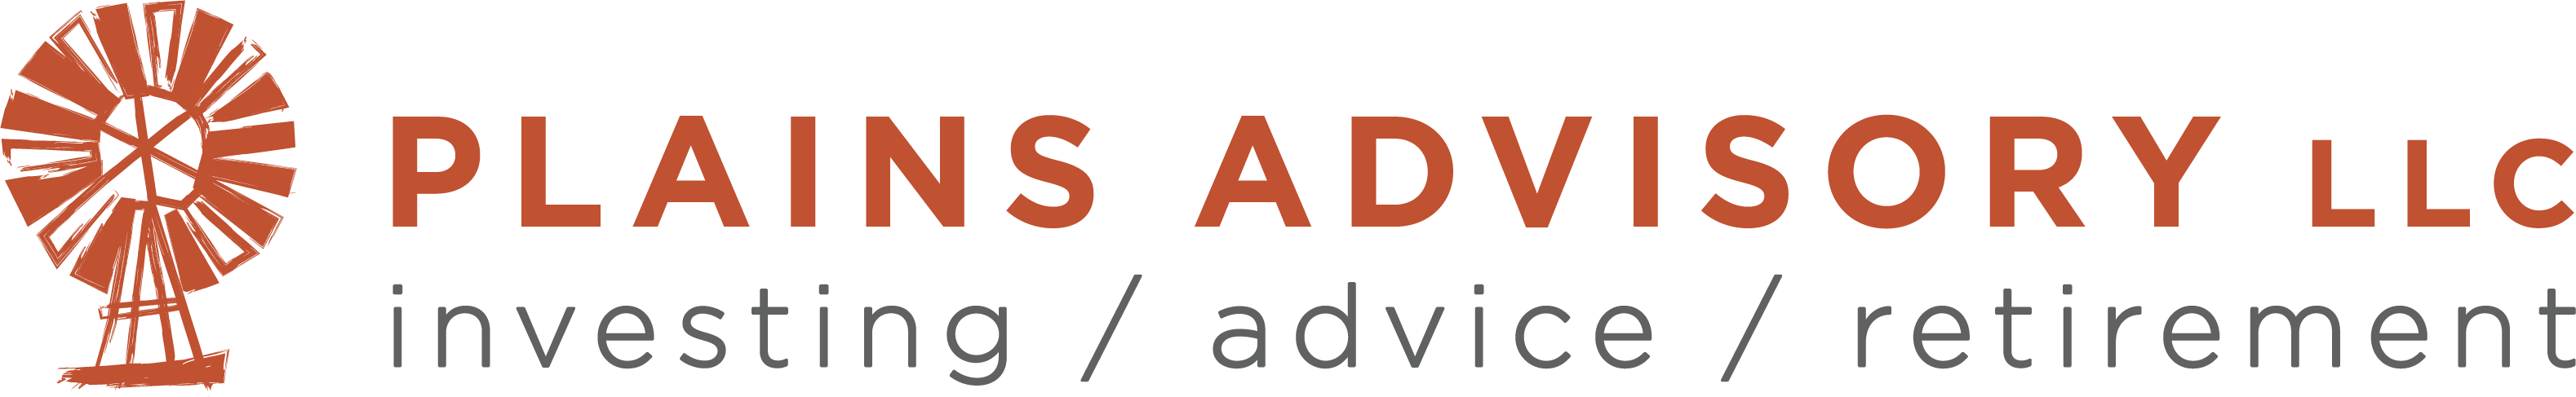 Logo for Plains Advisory